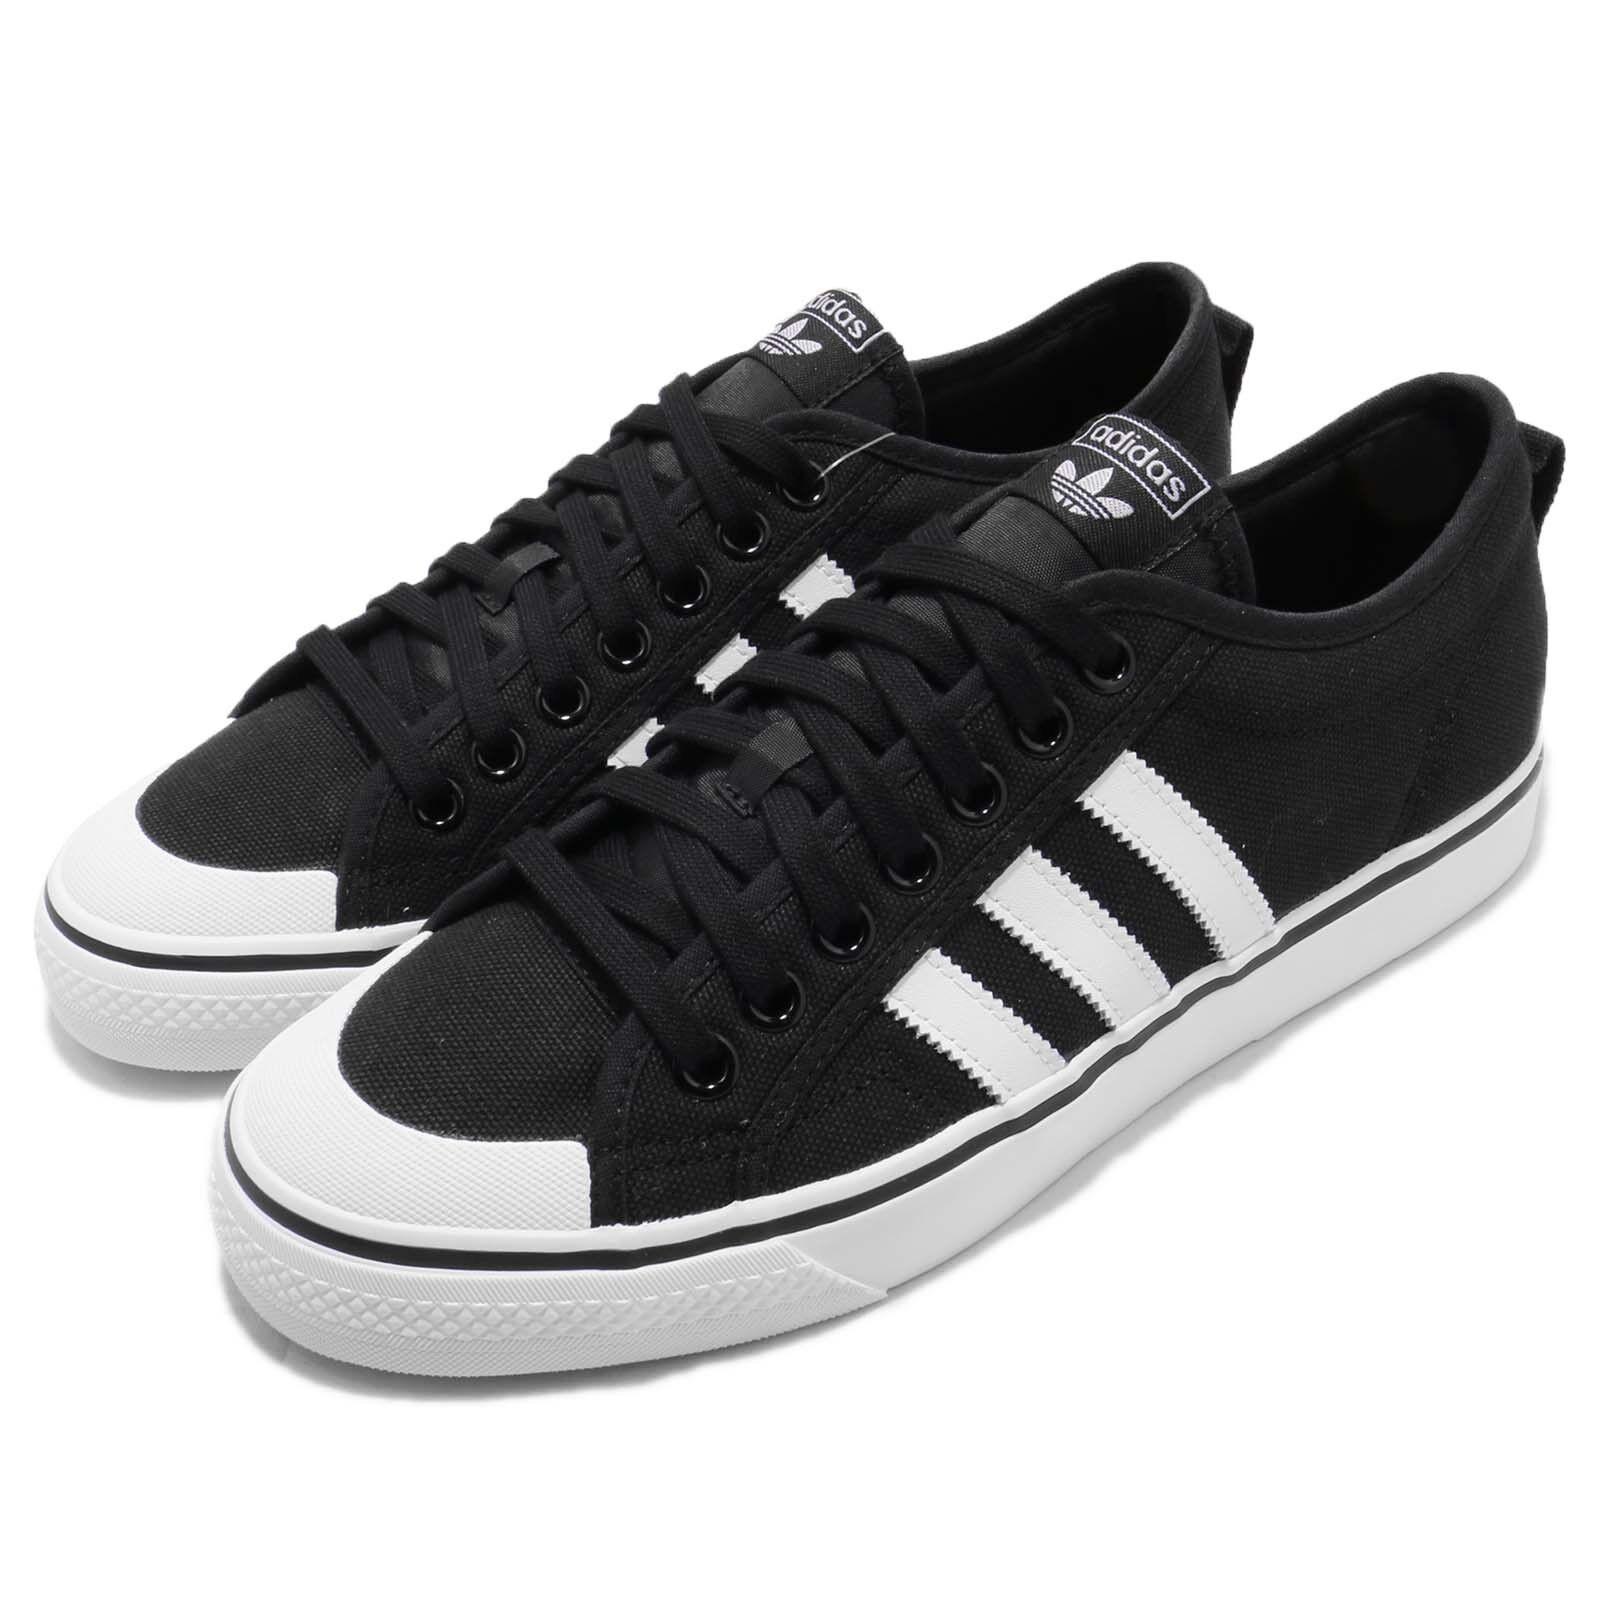 Adidas Originals Nizza Black White Canvas Men Casual shoes Sneakers CQ2332